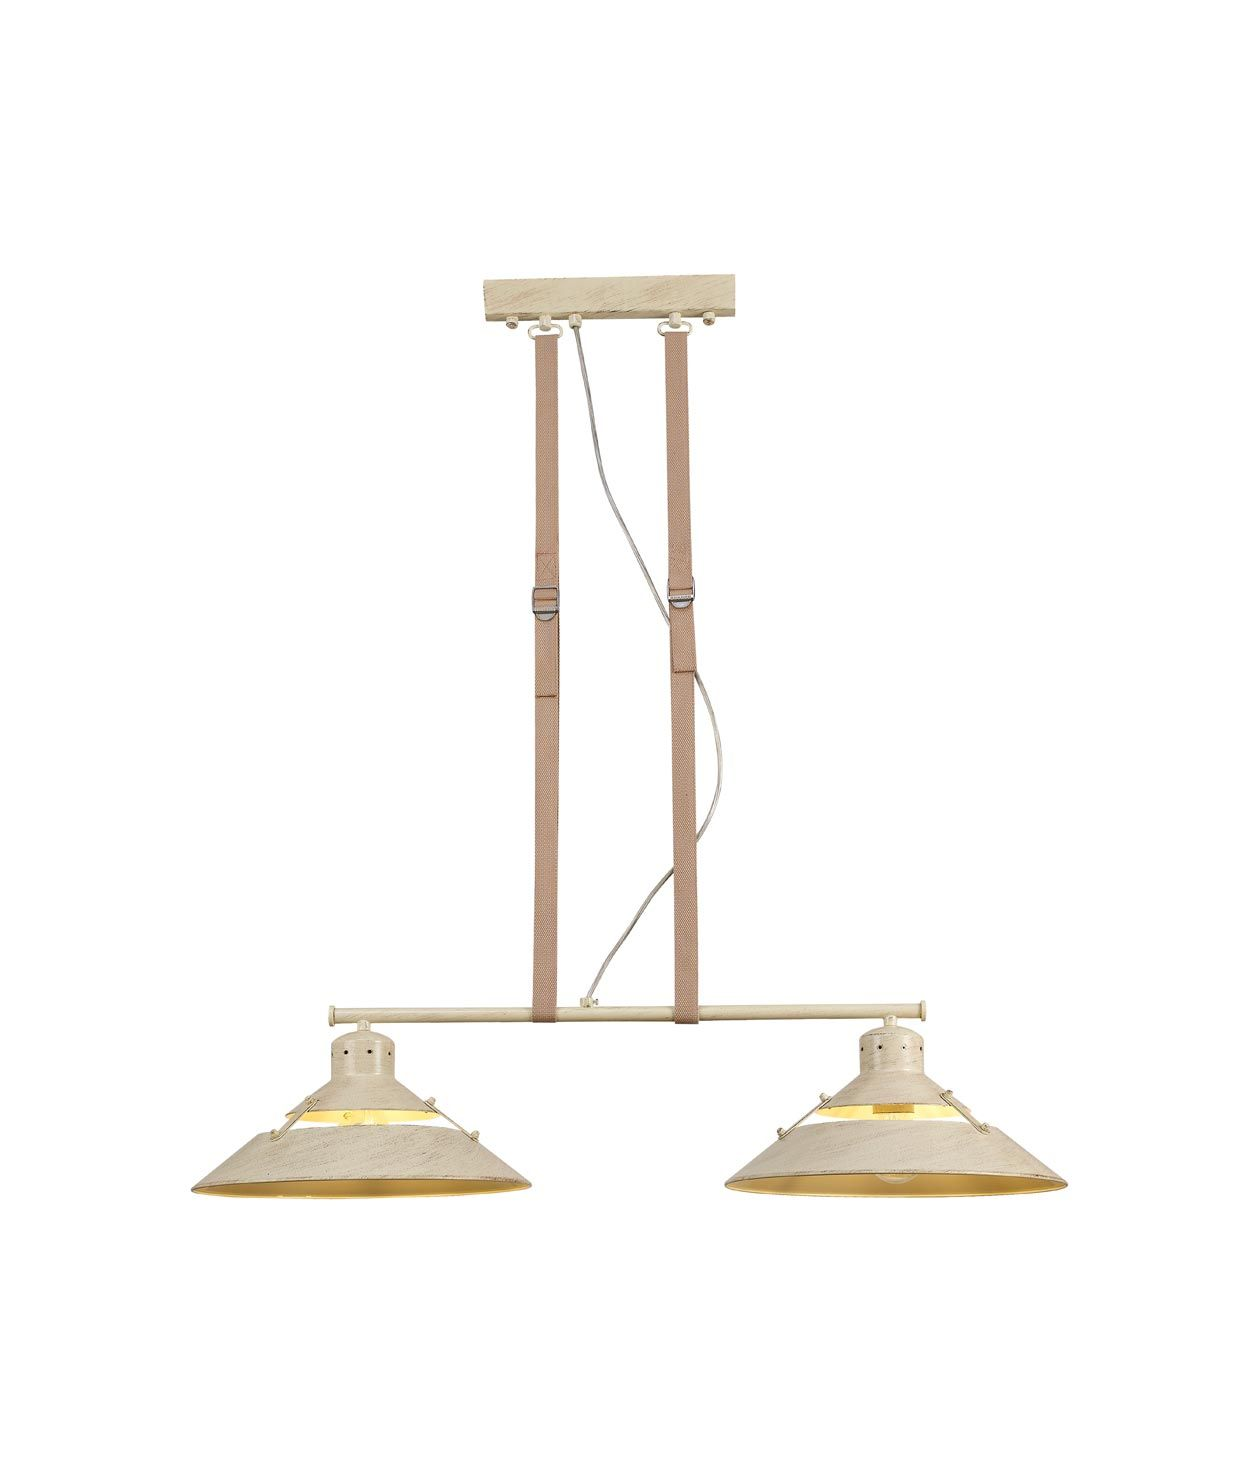 Lámpara de techo beige 2 luces INDUSTRIAL